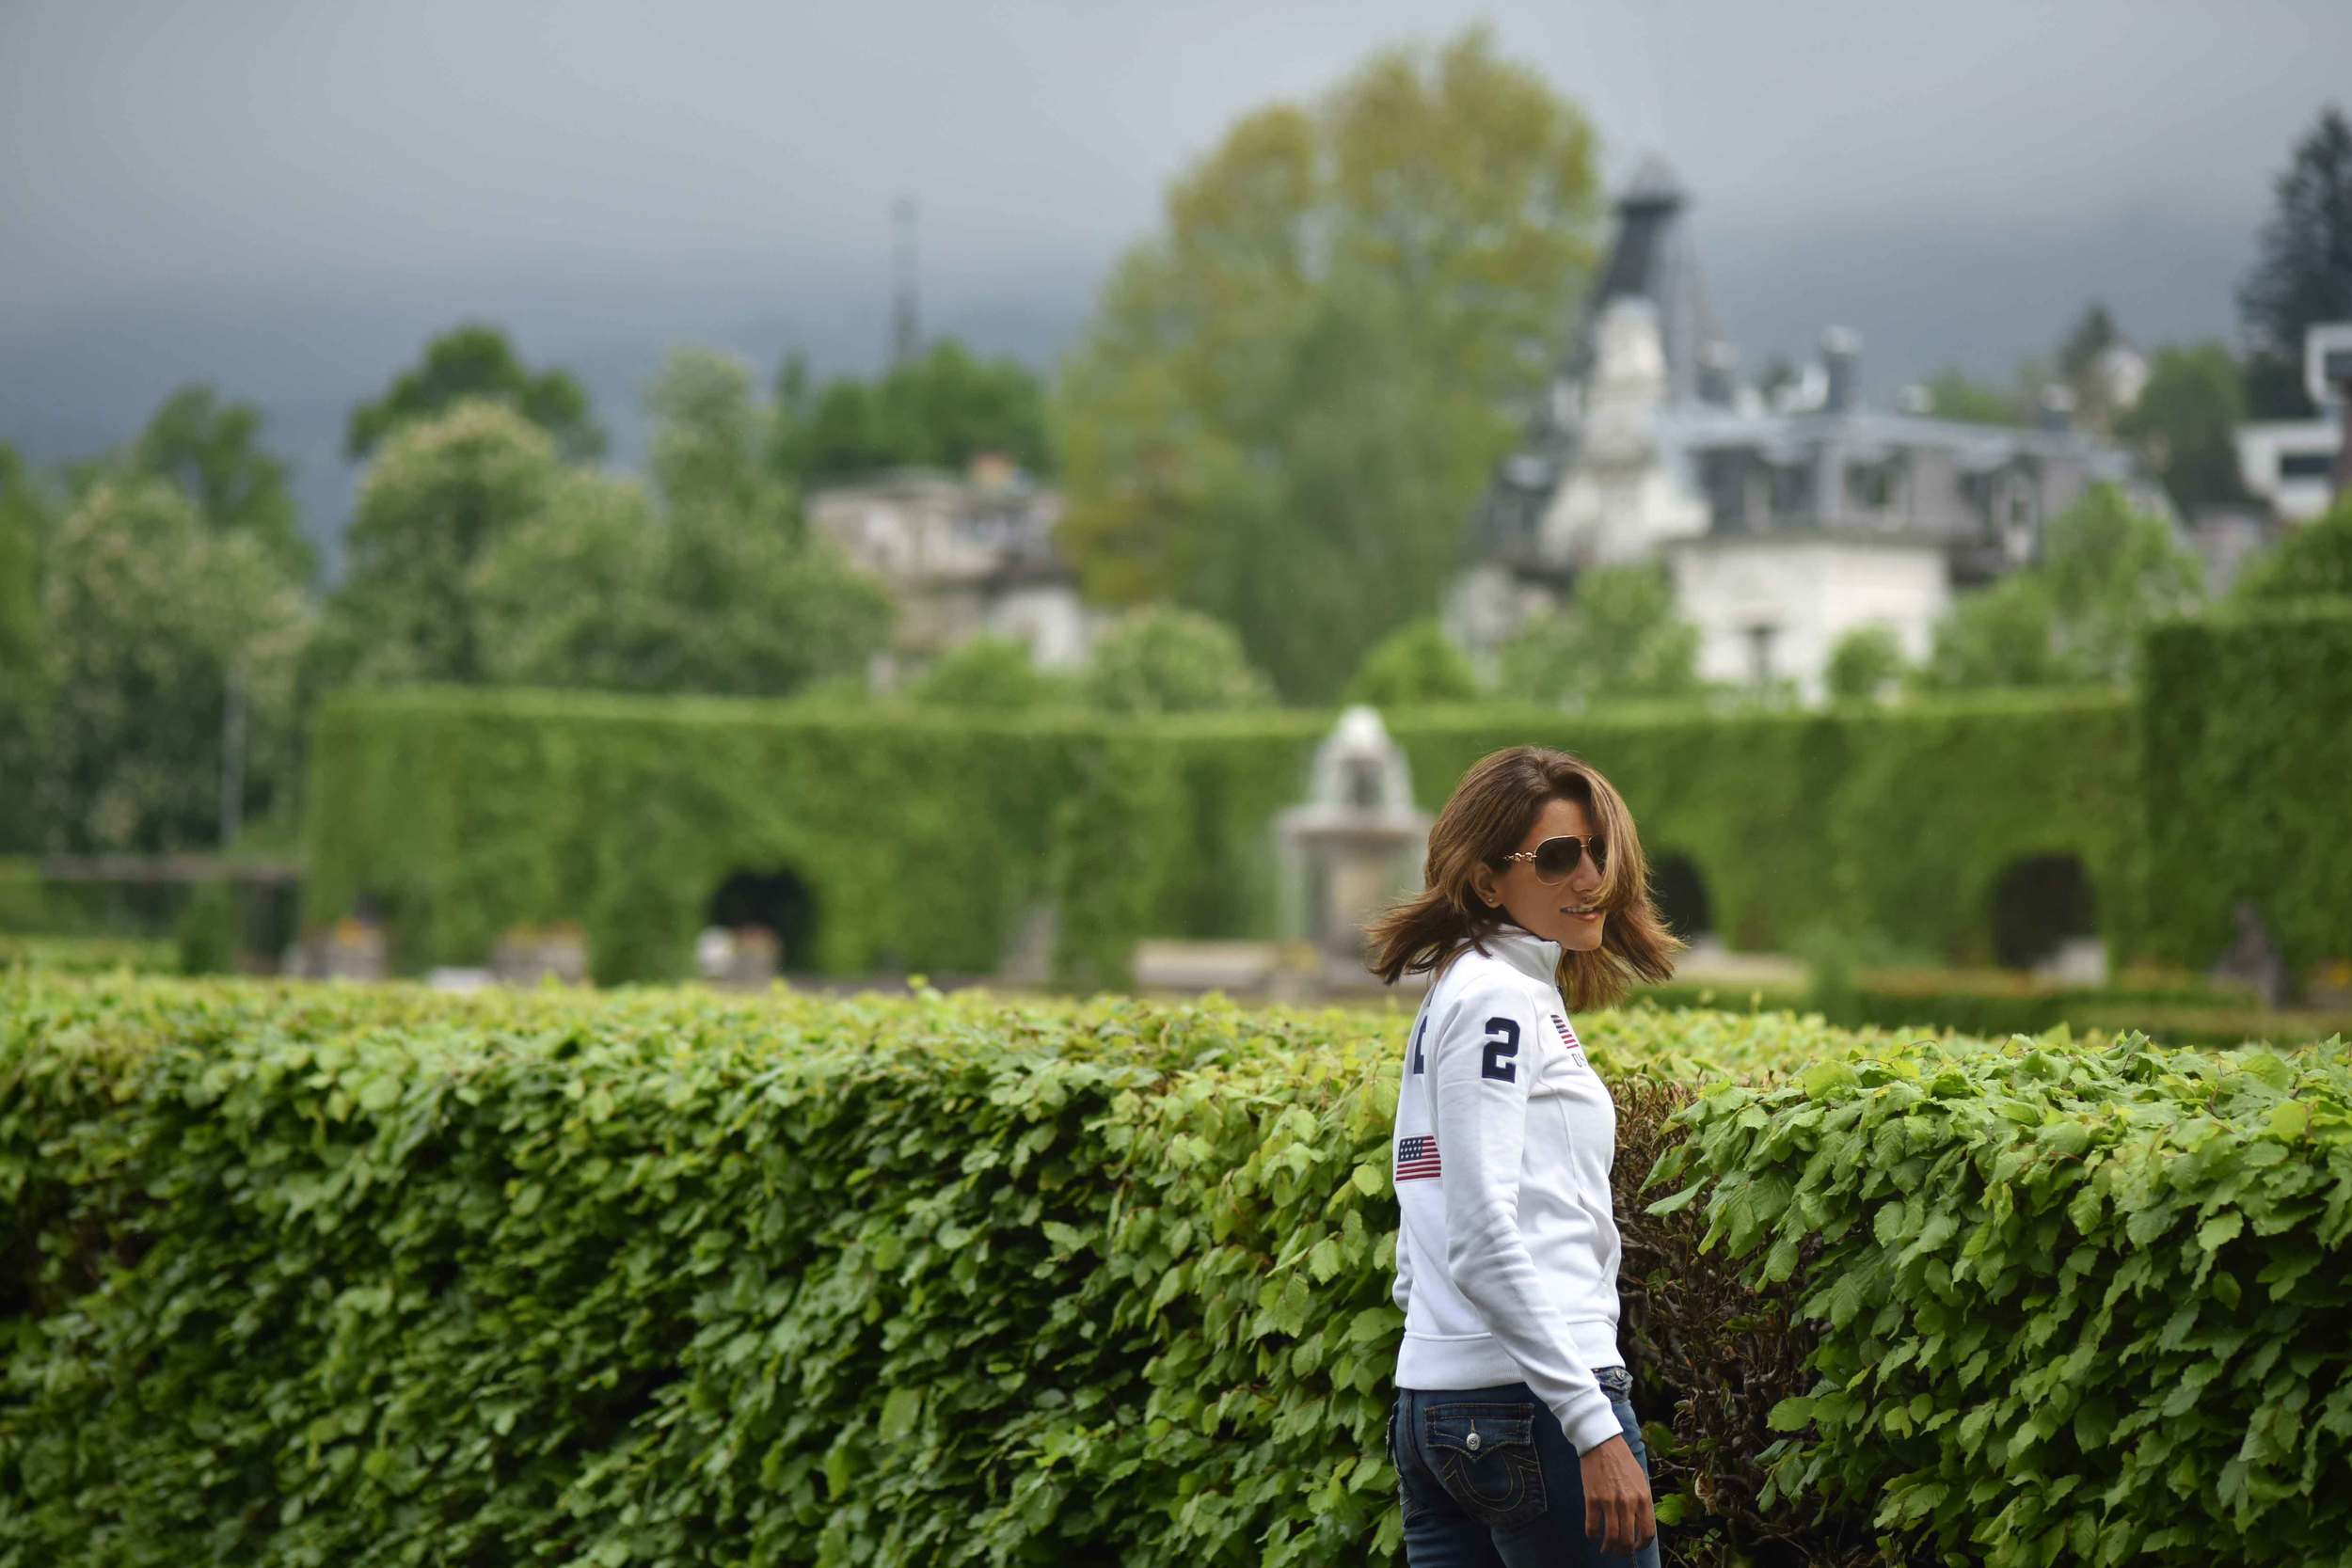 White Ralph Lauren Polo jacket, Gönneranlage, historic park, Baden Baden, Germany. Image©sourcingstyle.com